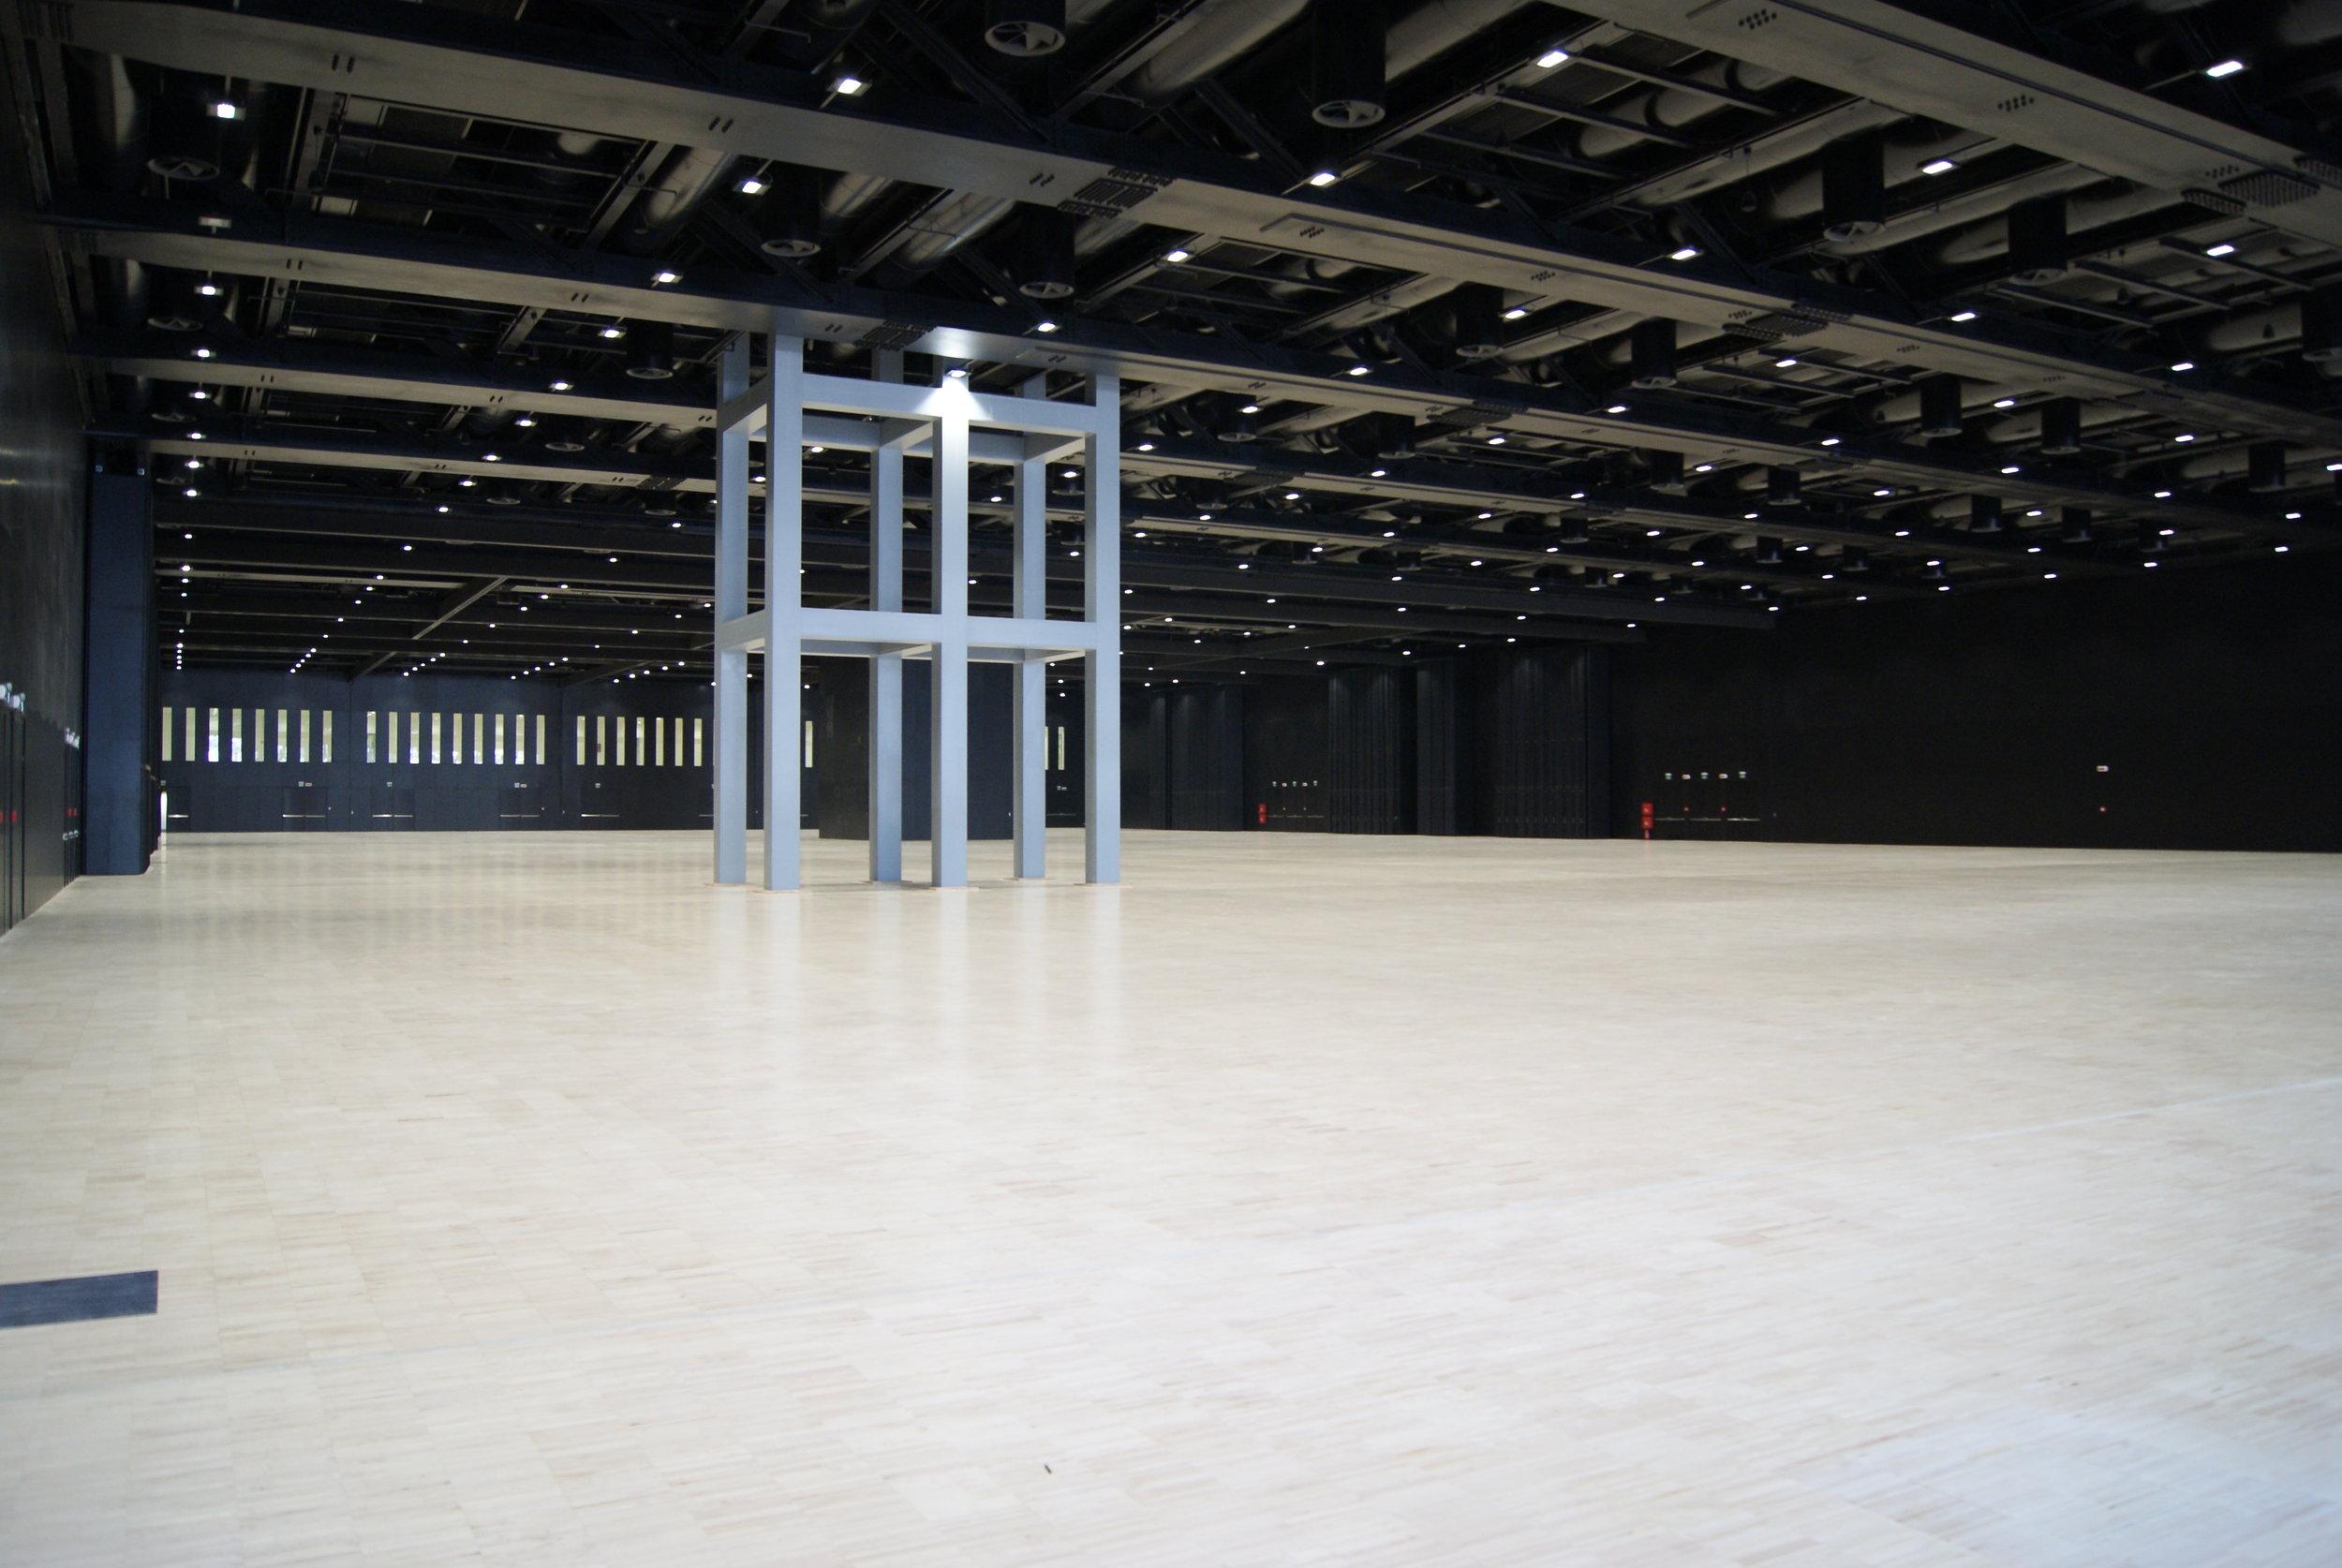 Nuvola_Meeting Halls6.JPG